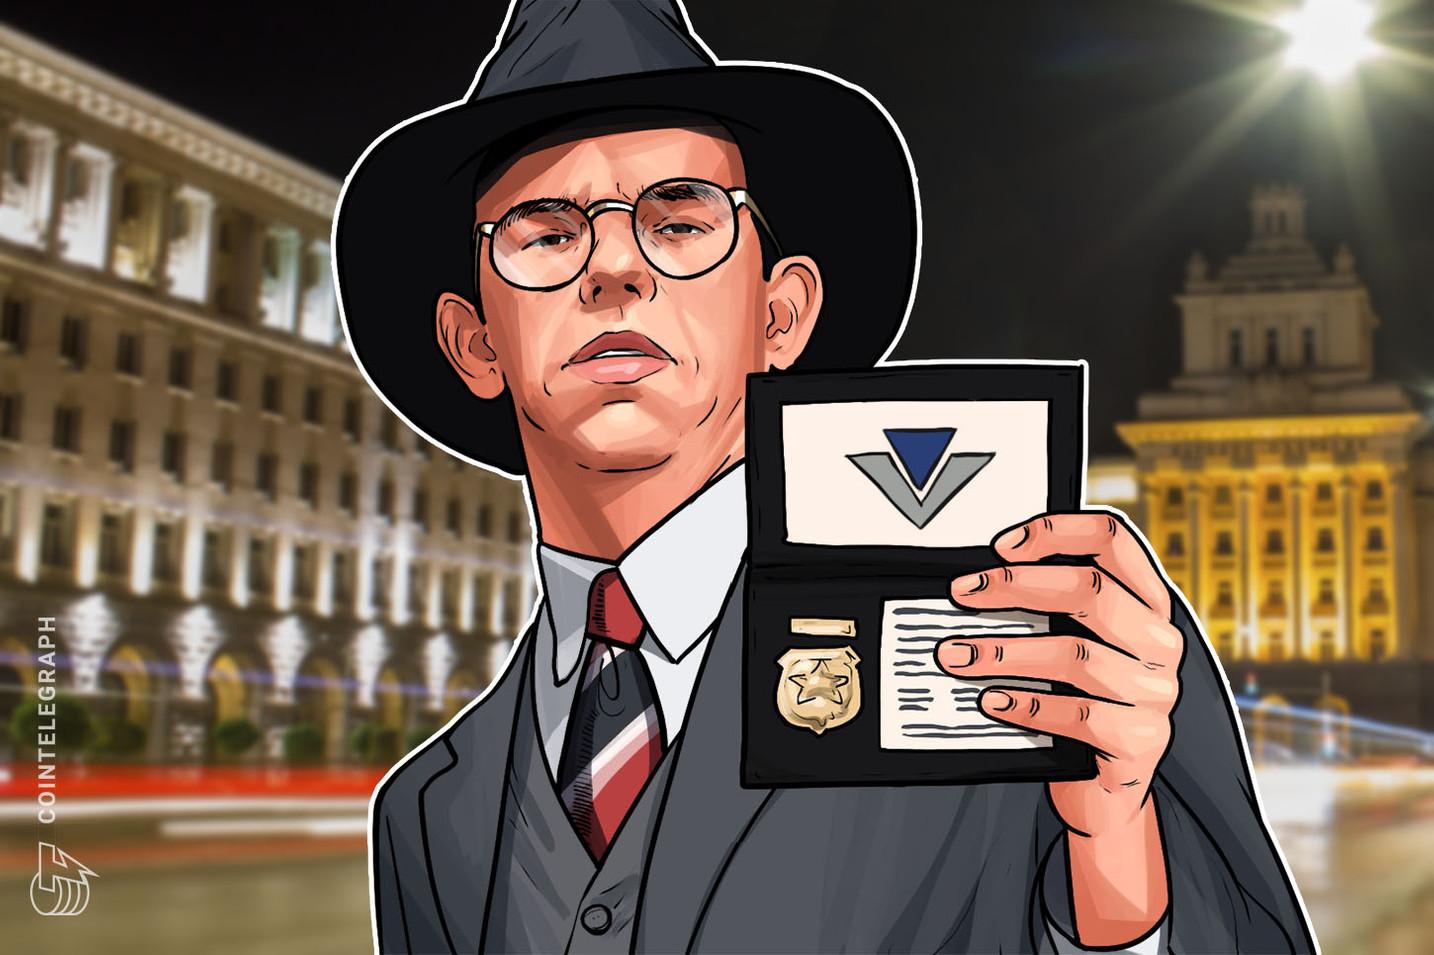 Bugarska agencija za prihode najavila je inspekciju kripto berzi